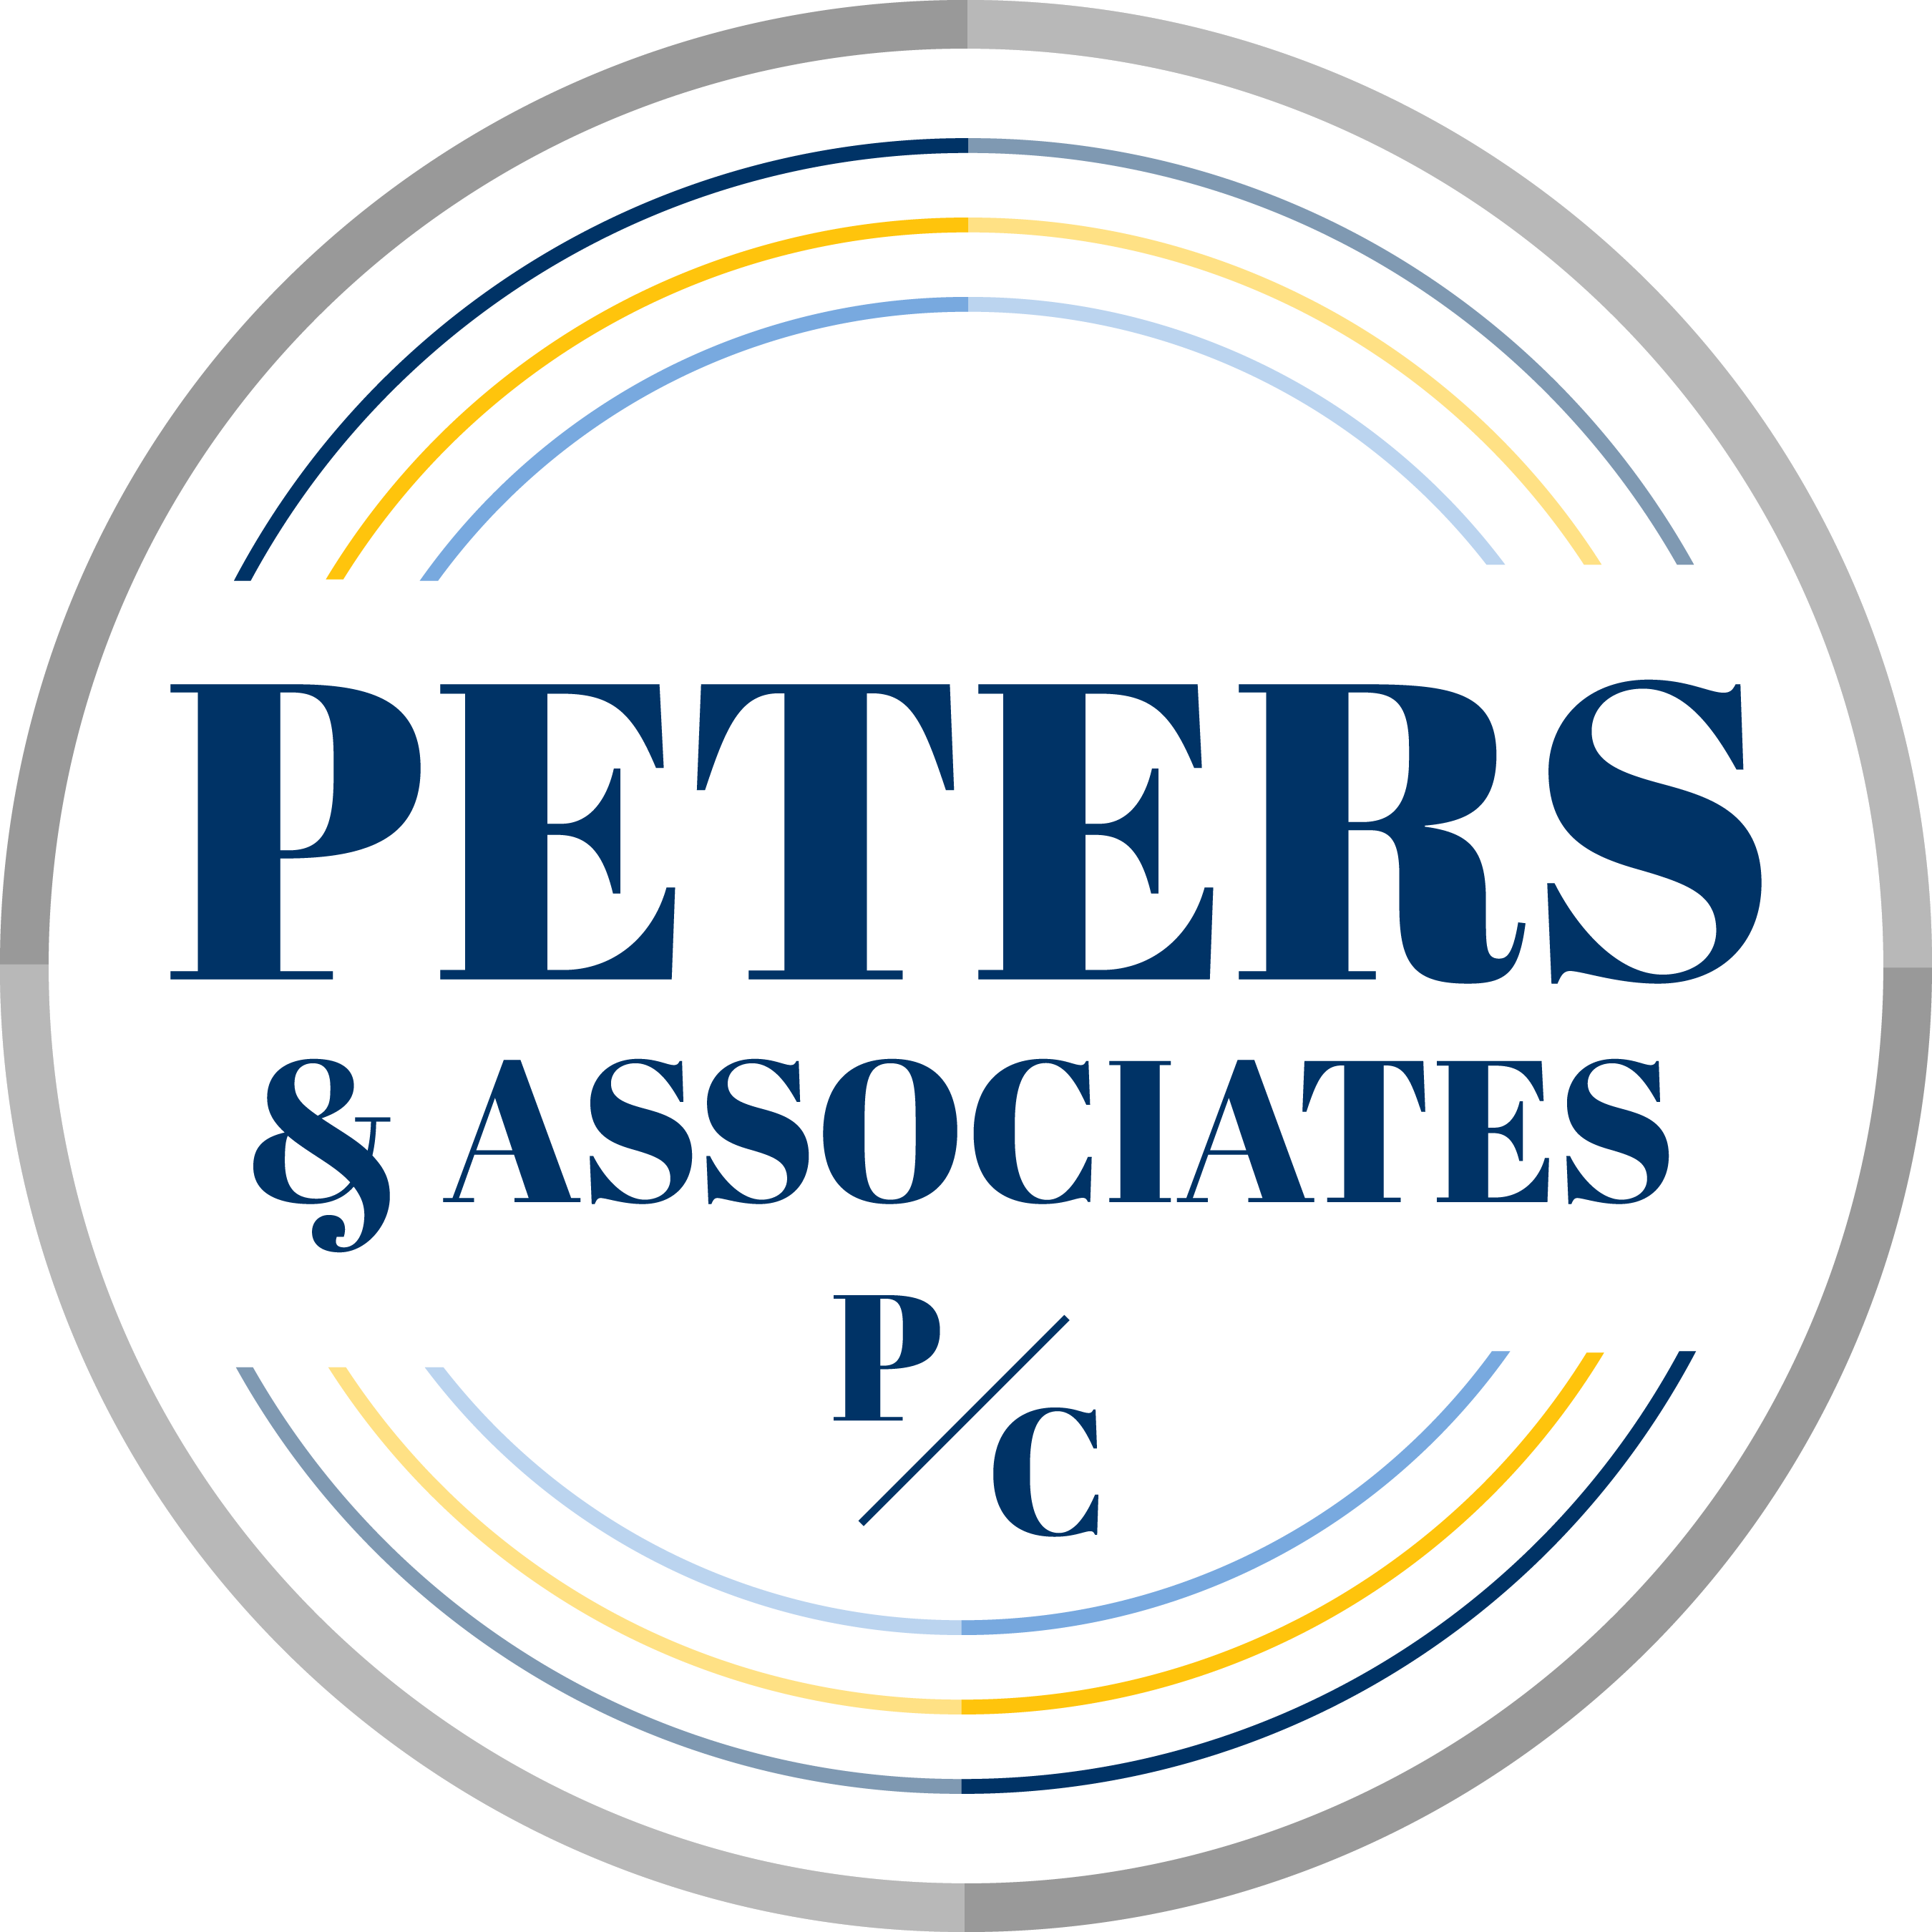 Peters & Associates, P.C.